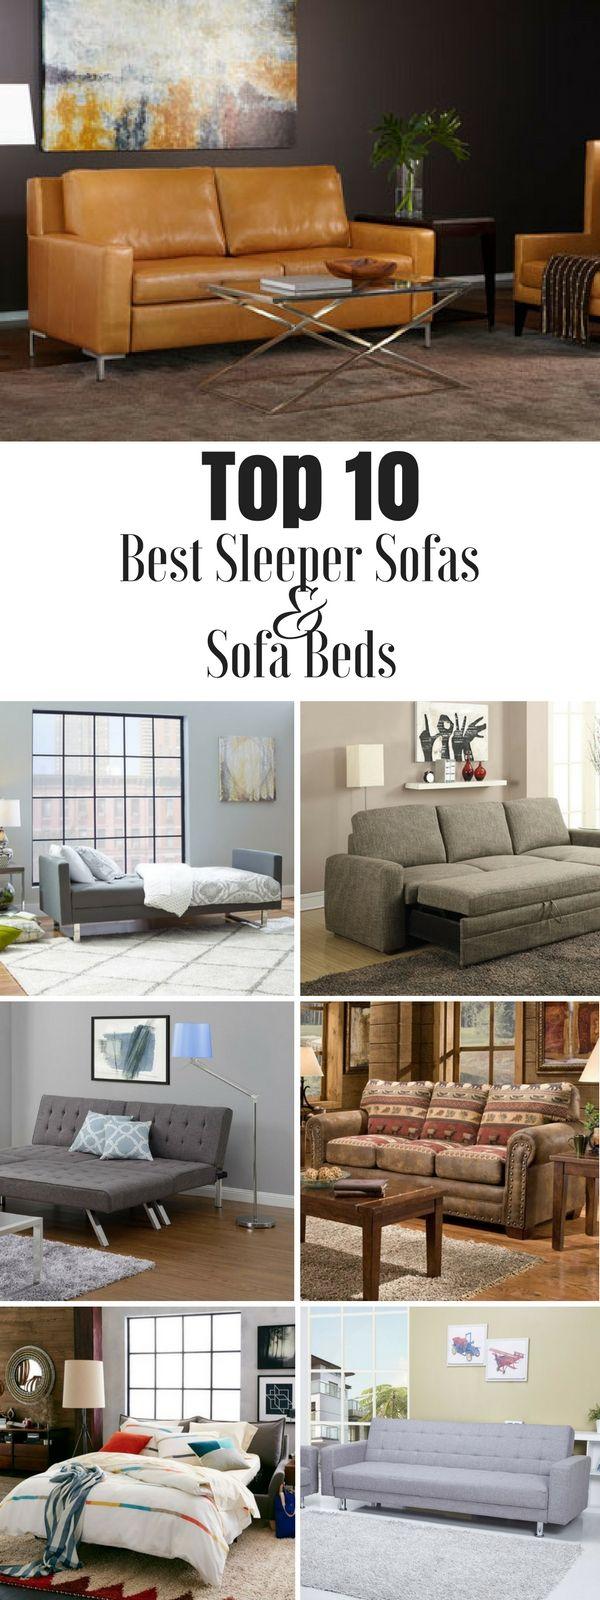 Diplomat sleeper sofa fold down sleeper sofa blu dot in modern sleeper - Check Out The Top 10 Best Sleeper Sofas And Sofa Beds Istandarddesign